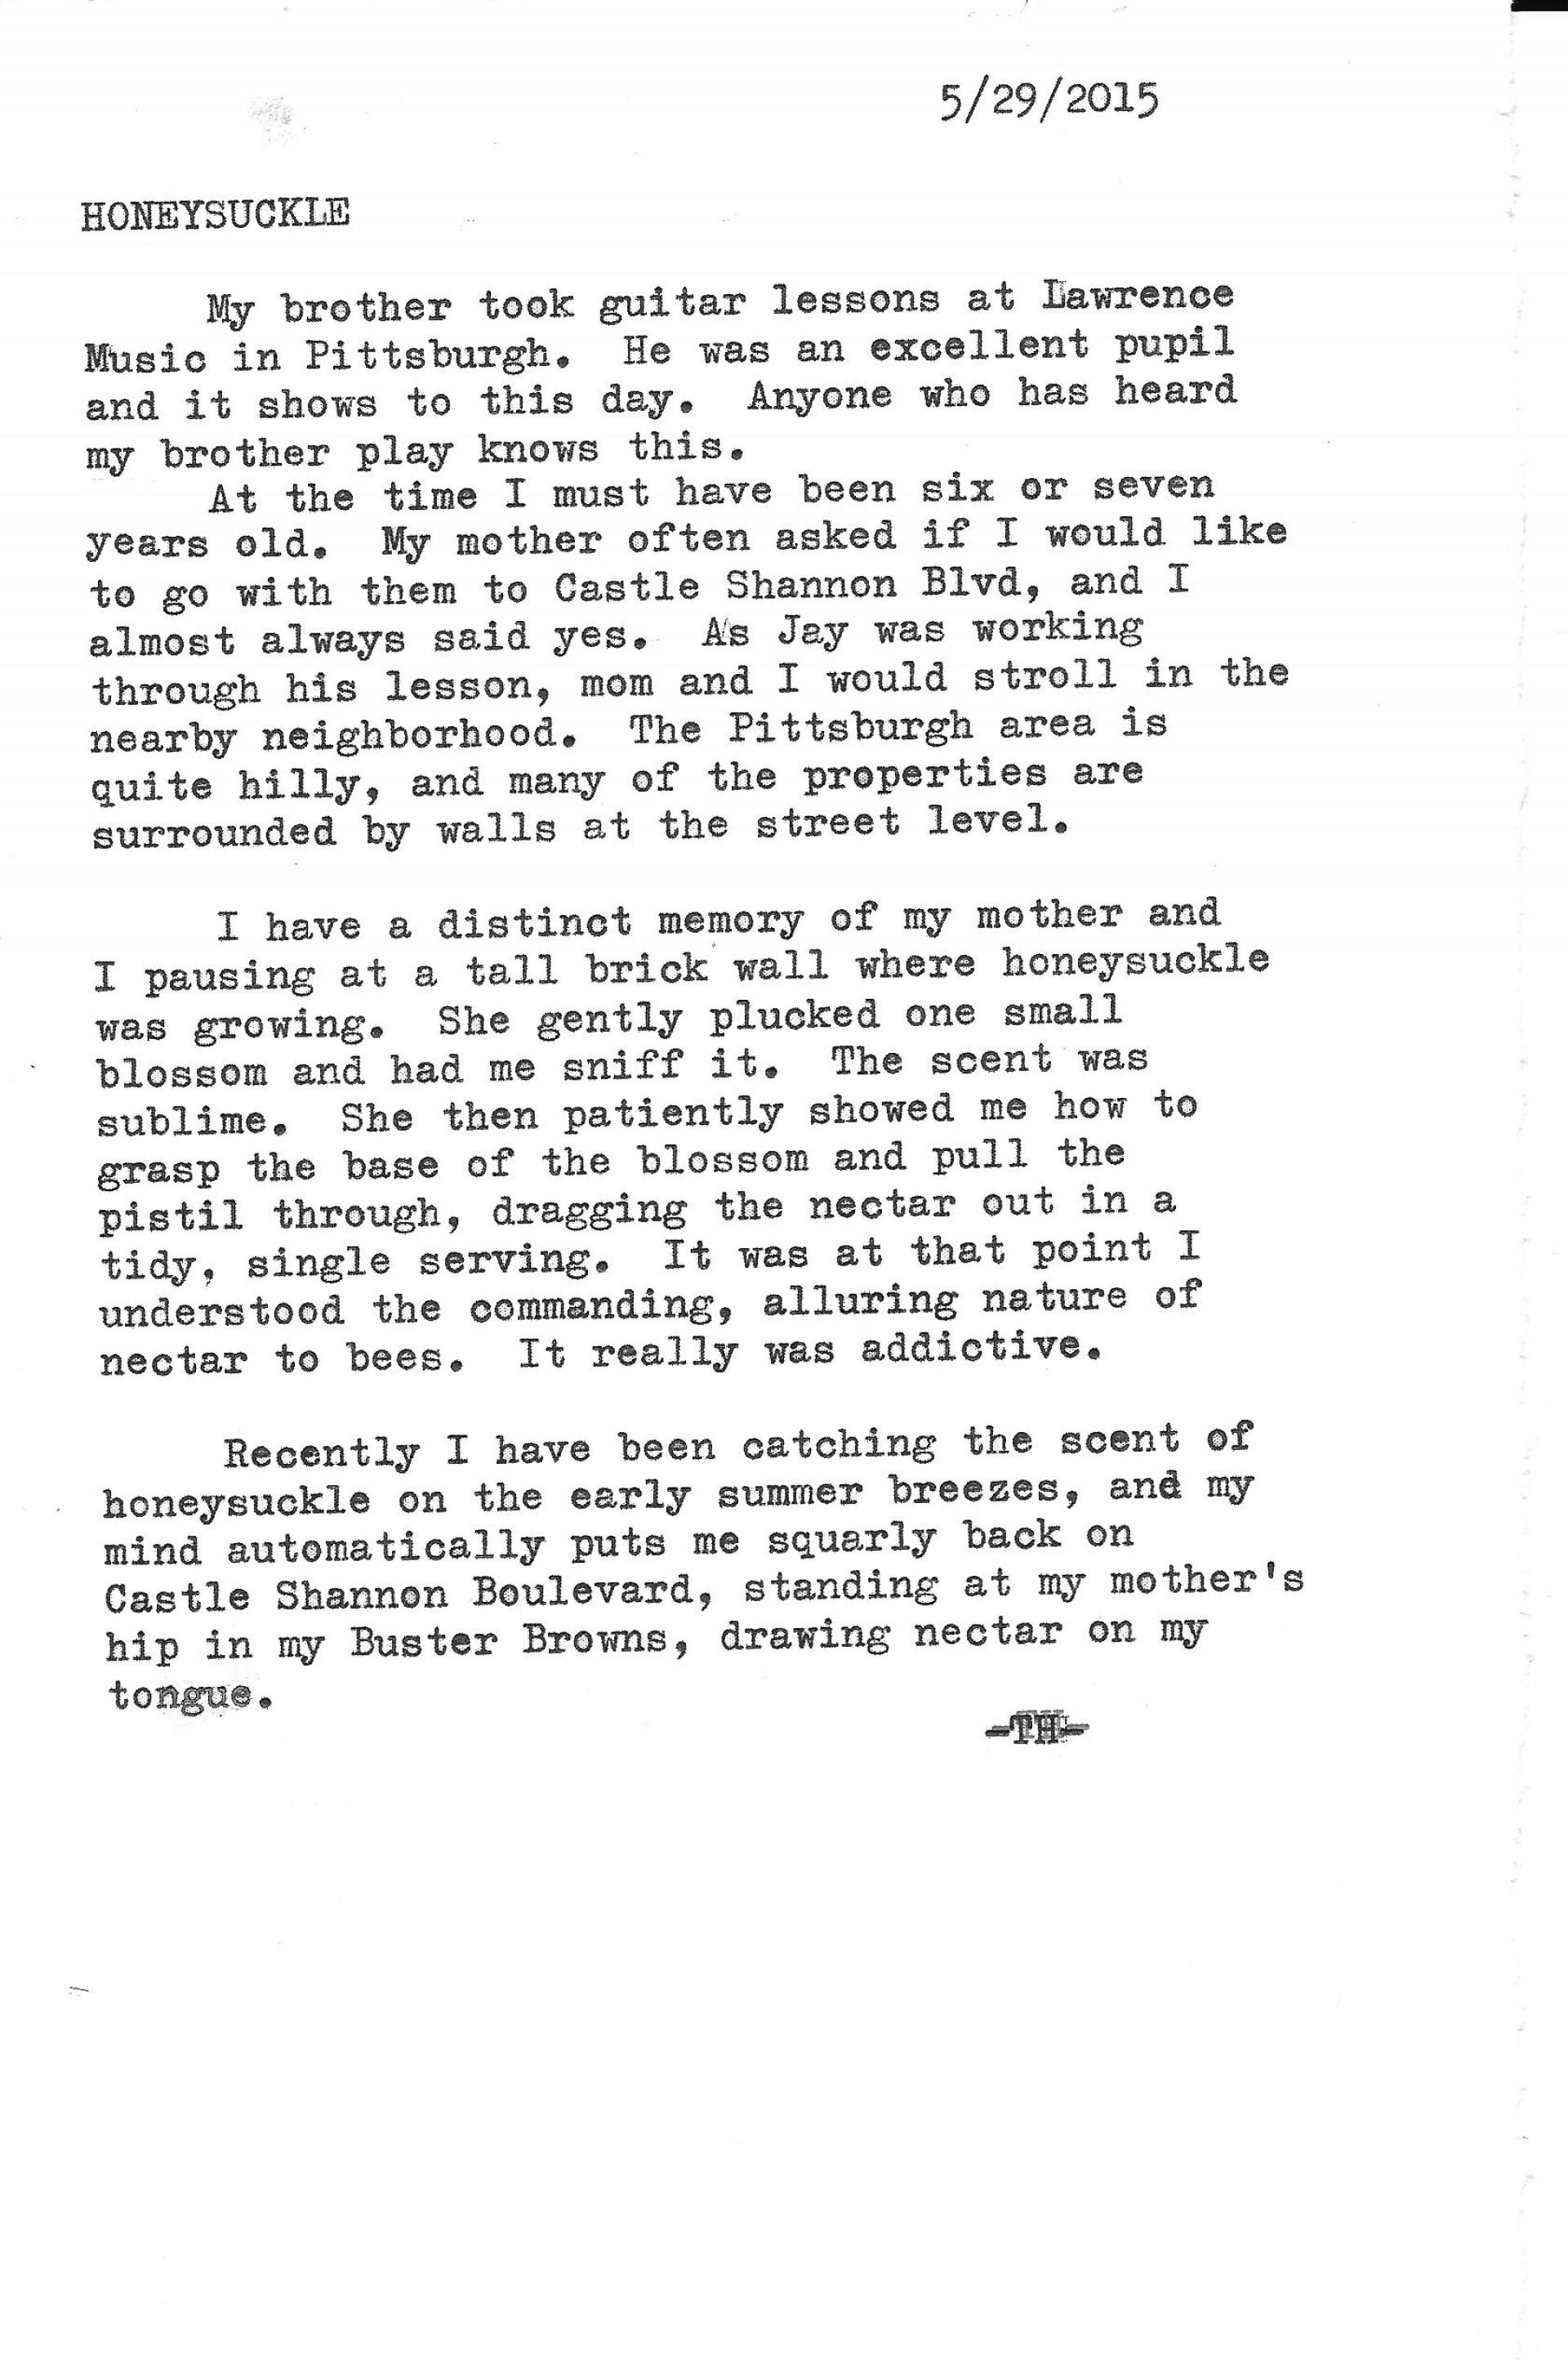 001 Childhood Memory Essay Honeysuckle Top Ideas Earliest My Memories Example 1920